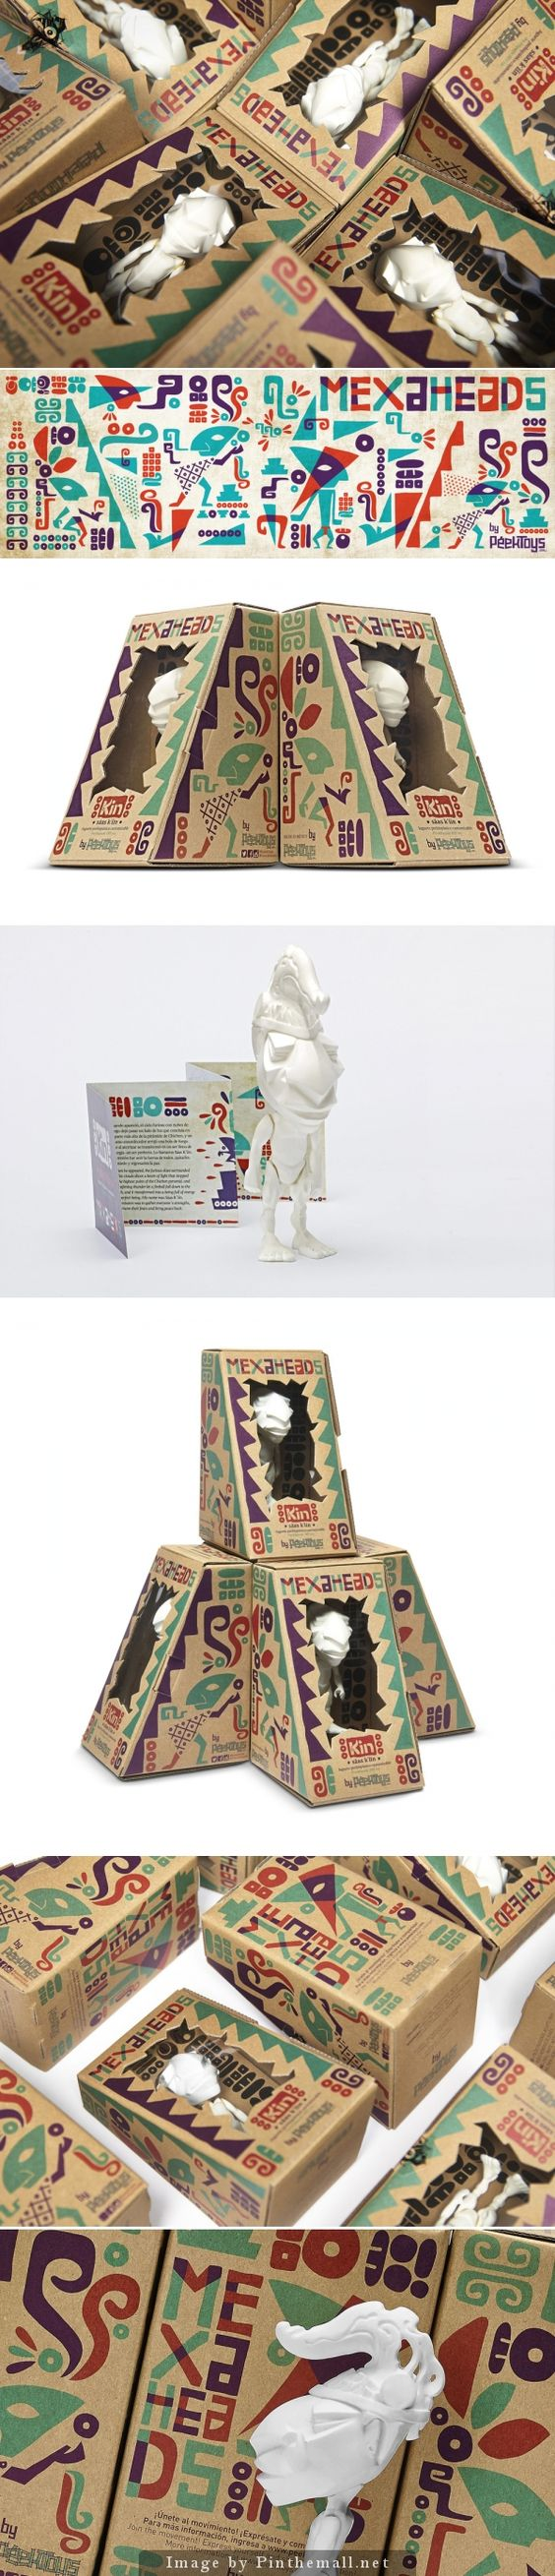 Mexaheads fun packaging PD